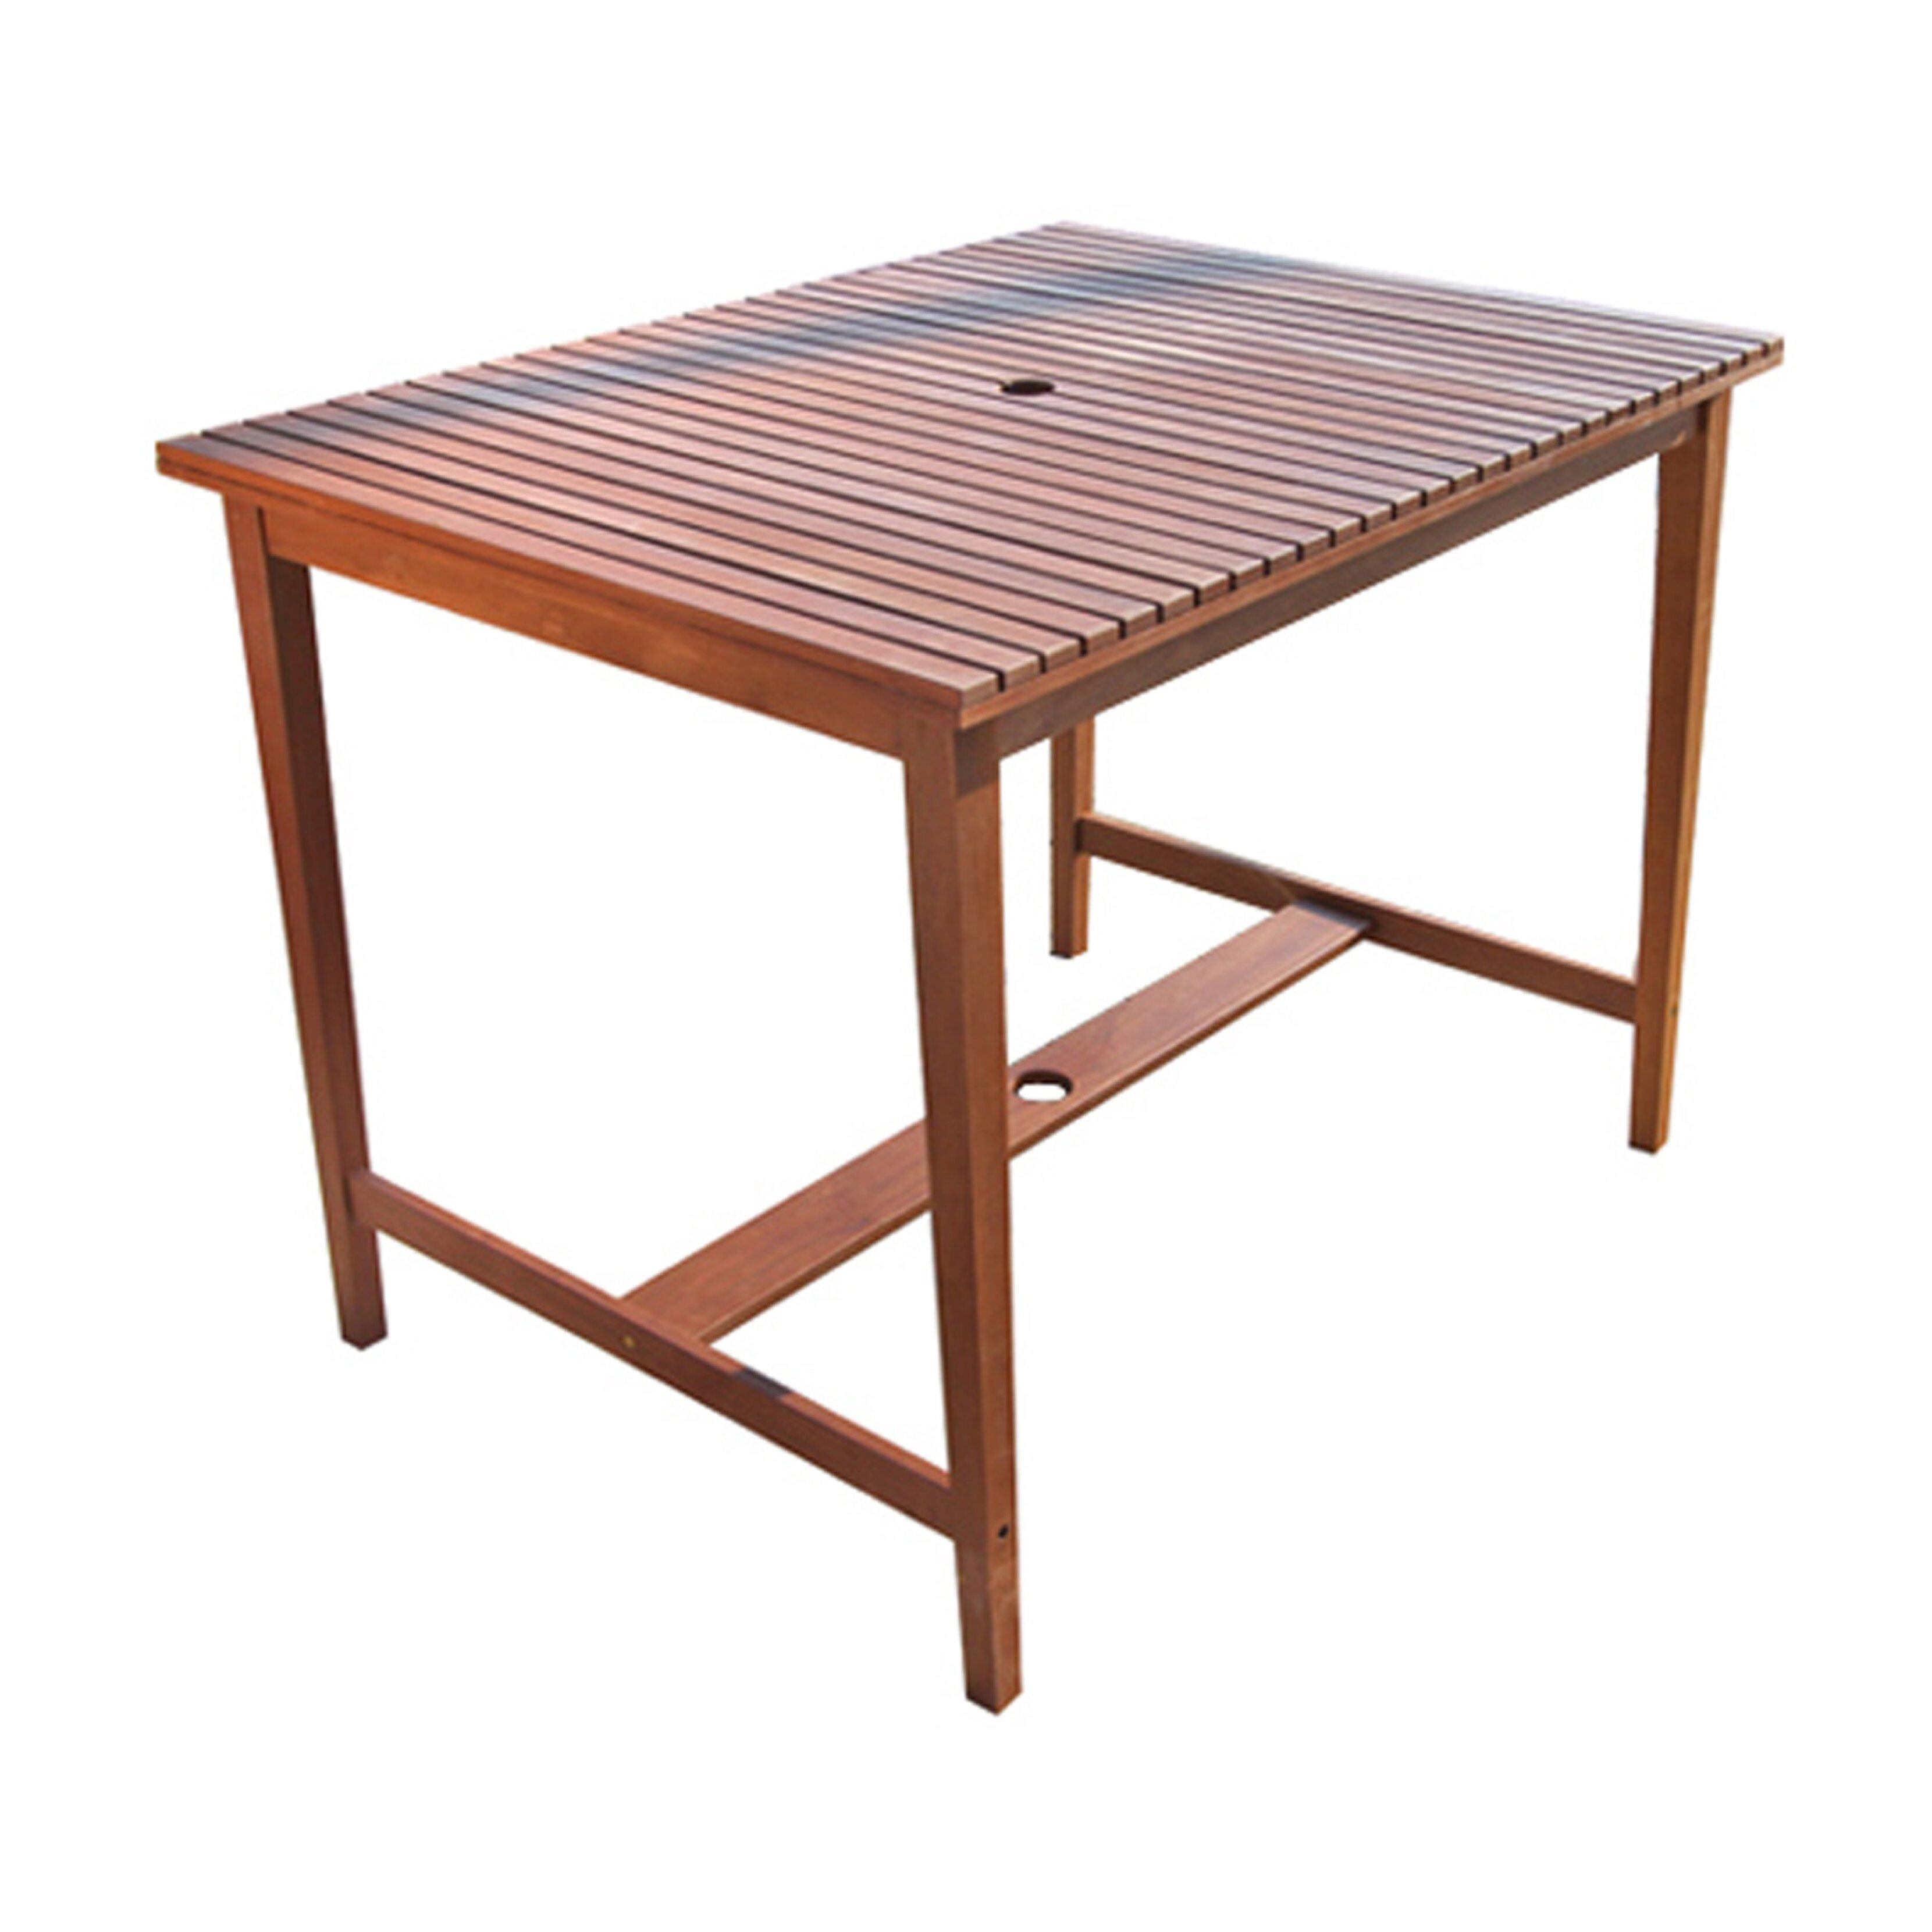 Jordan Manufacturing Ridge Bar Table amp Reviews Wayfairca : Ridge2BBar2BTable from www.wayfair.ca size 3321 x 3321 jpeg 356kB